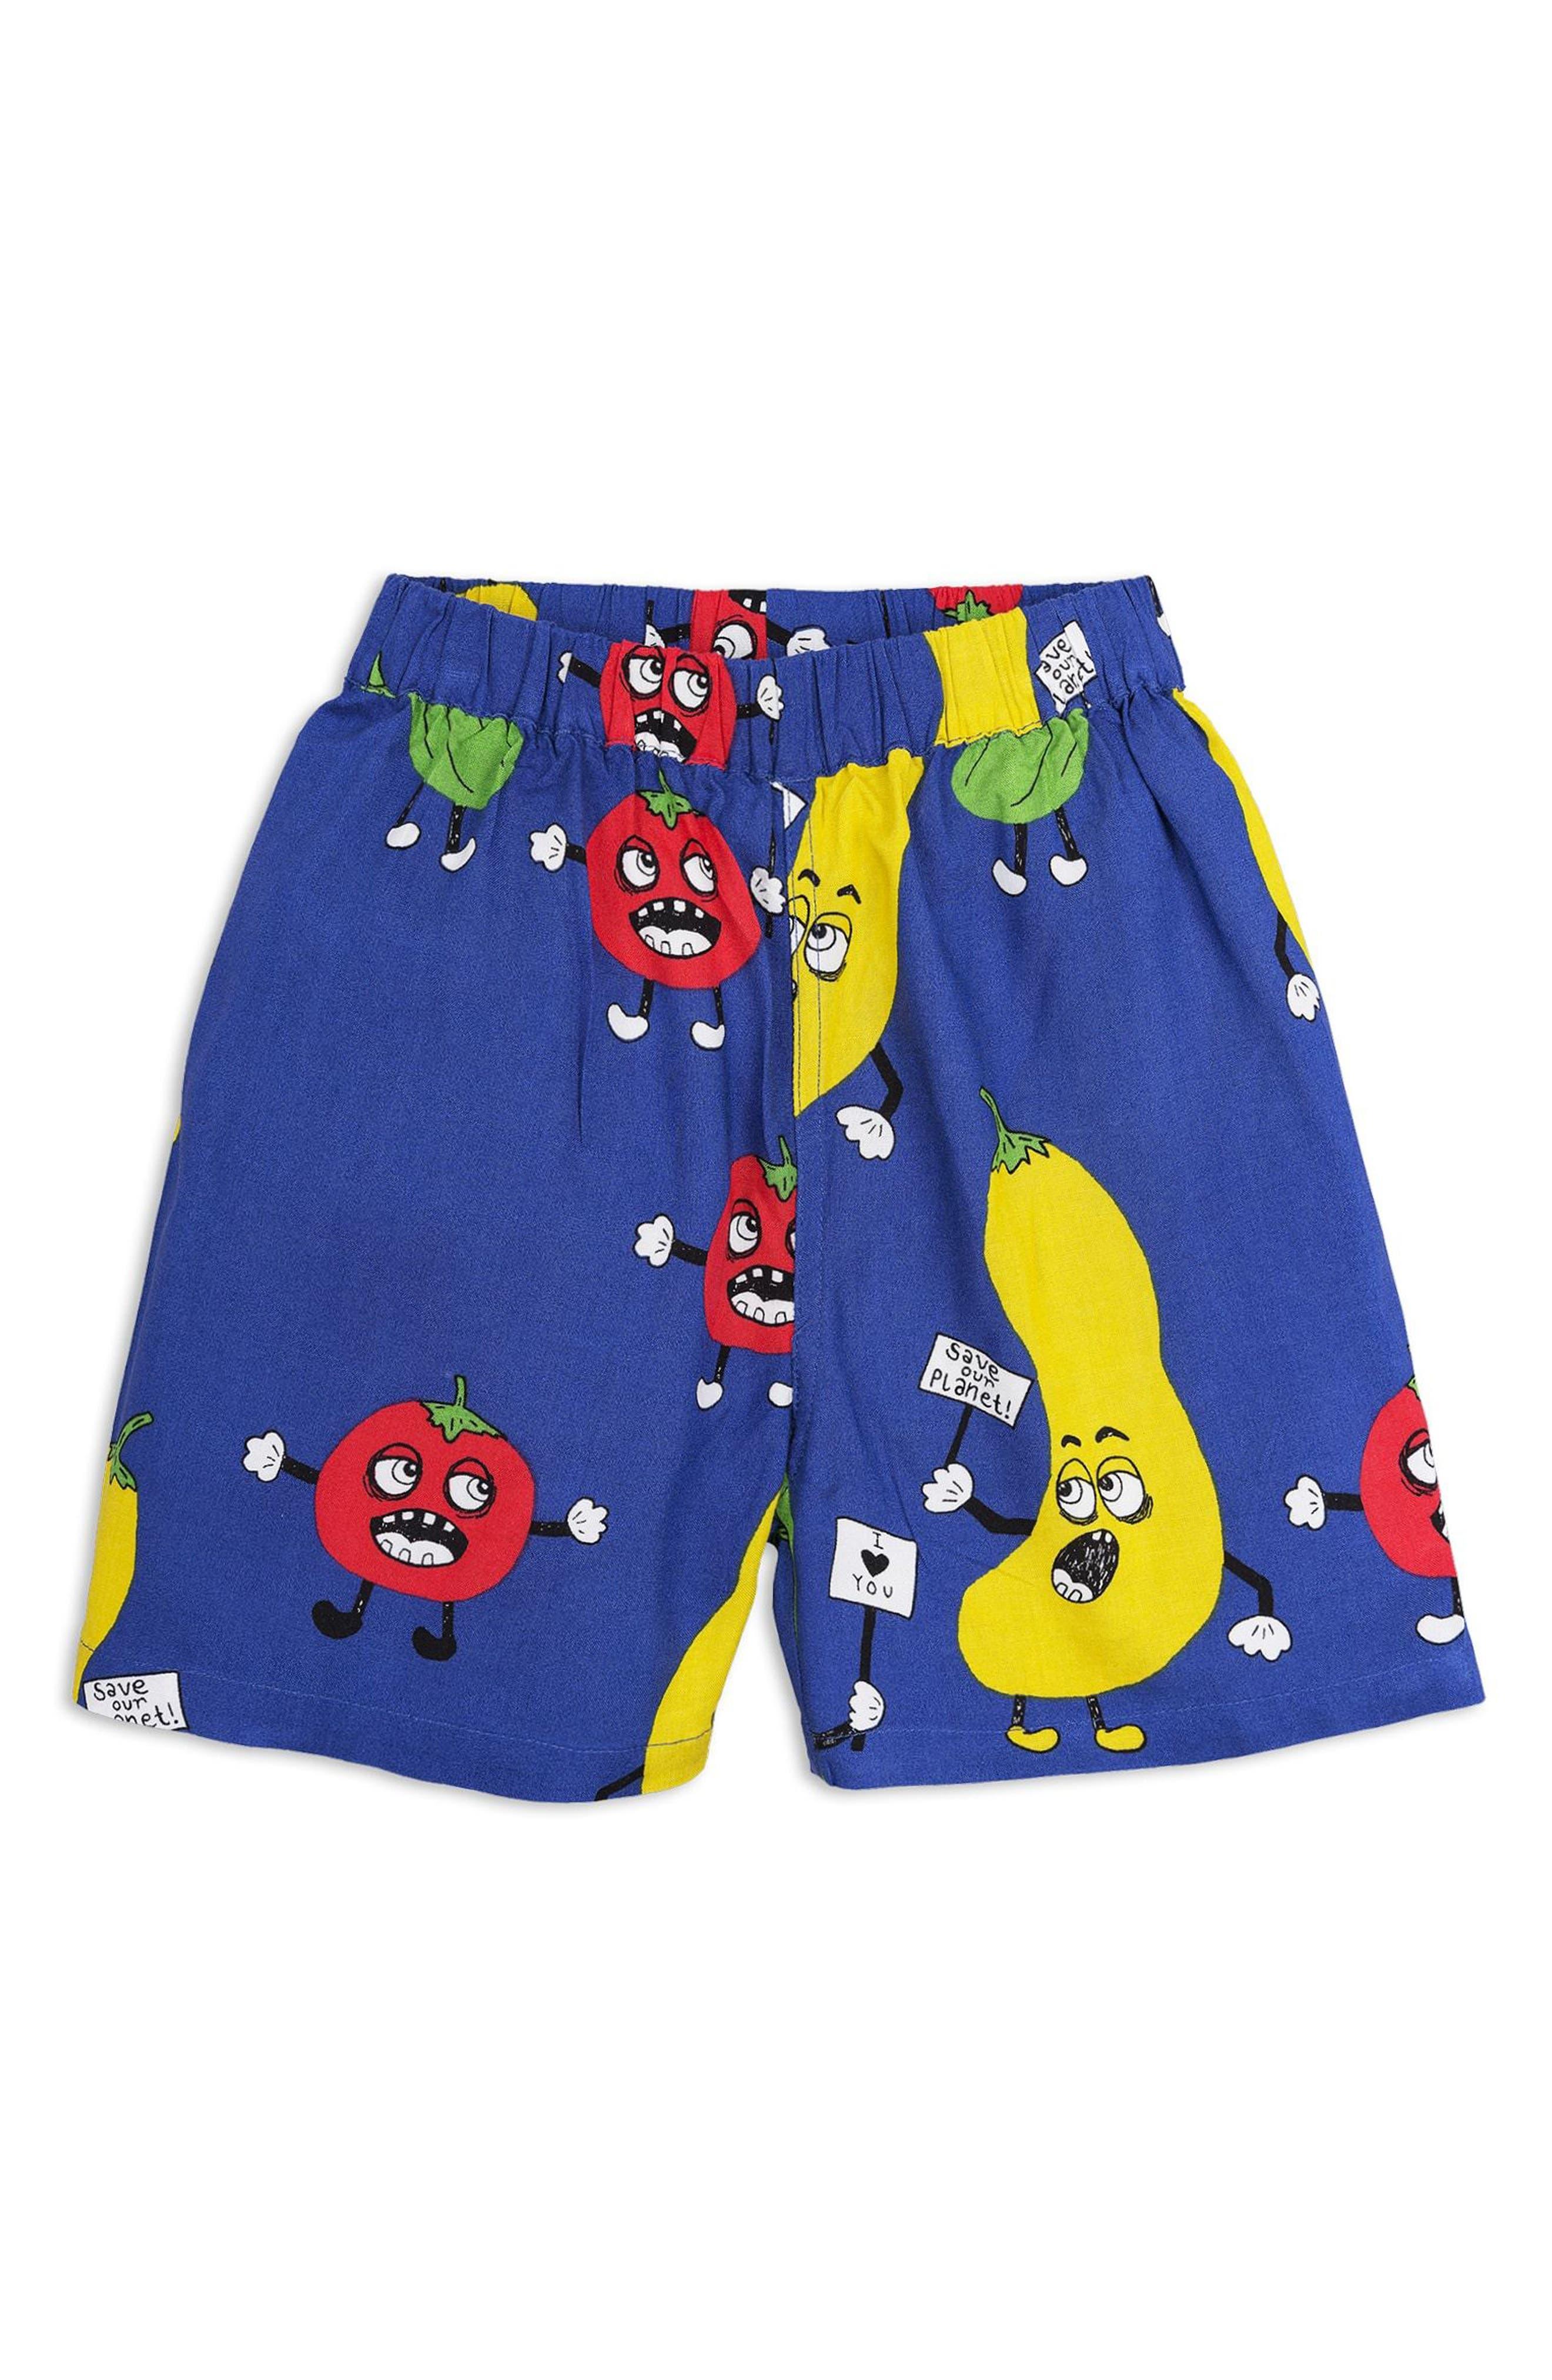 Veggie Woven Shorts,                             Alternate thumbnail 2, color,                             400